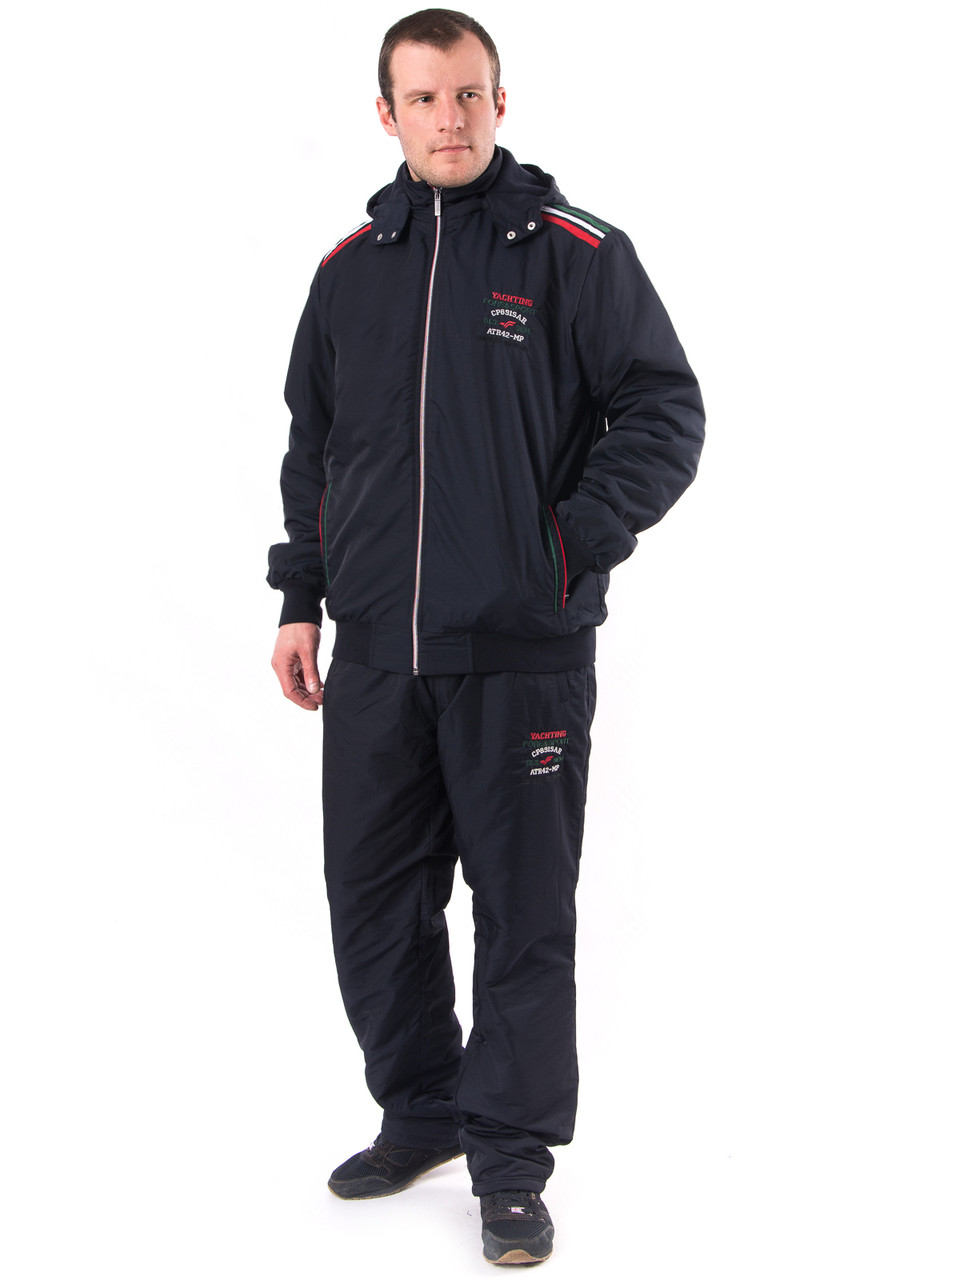 9853b93f Мужской теплый спортивный костюм плащевка на флисе т.м. Fore 1146 ...